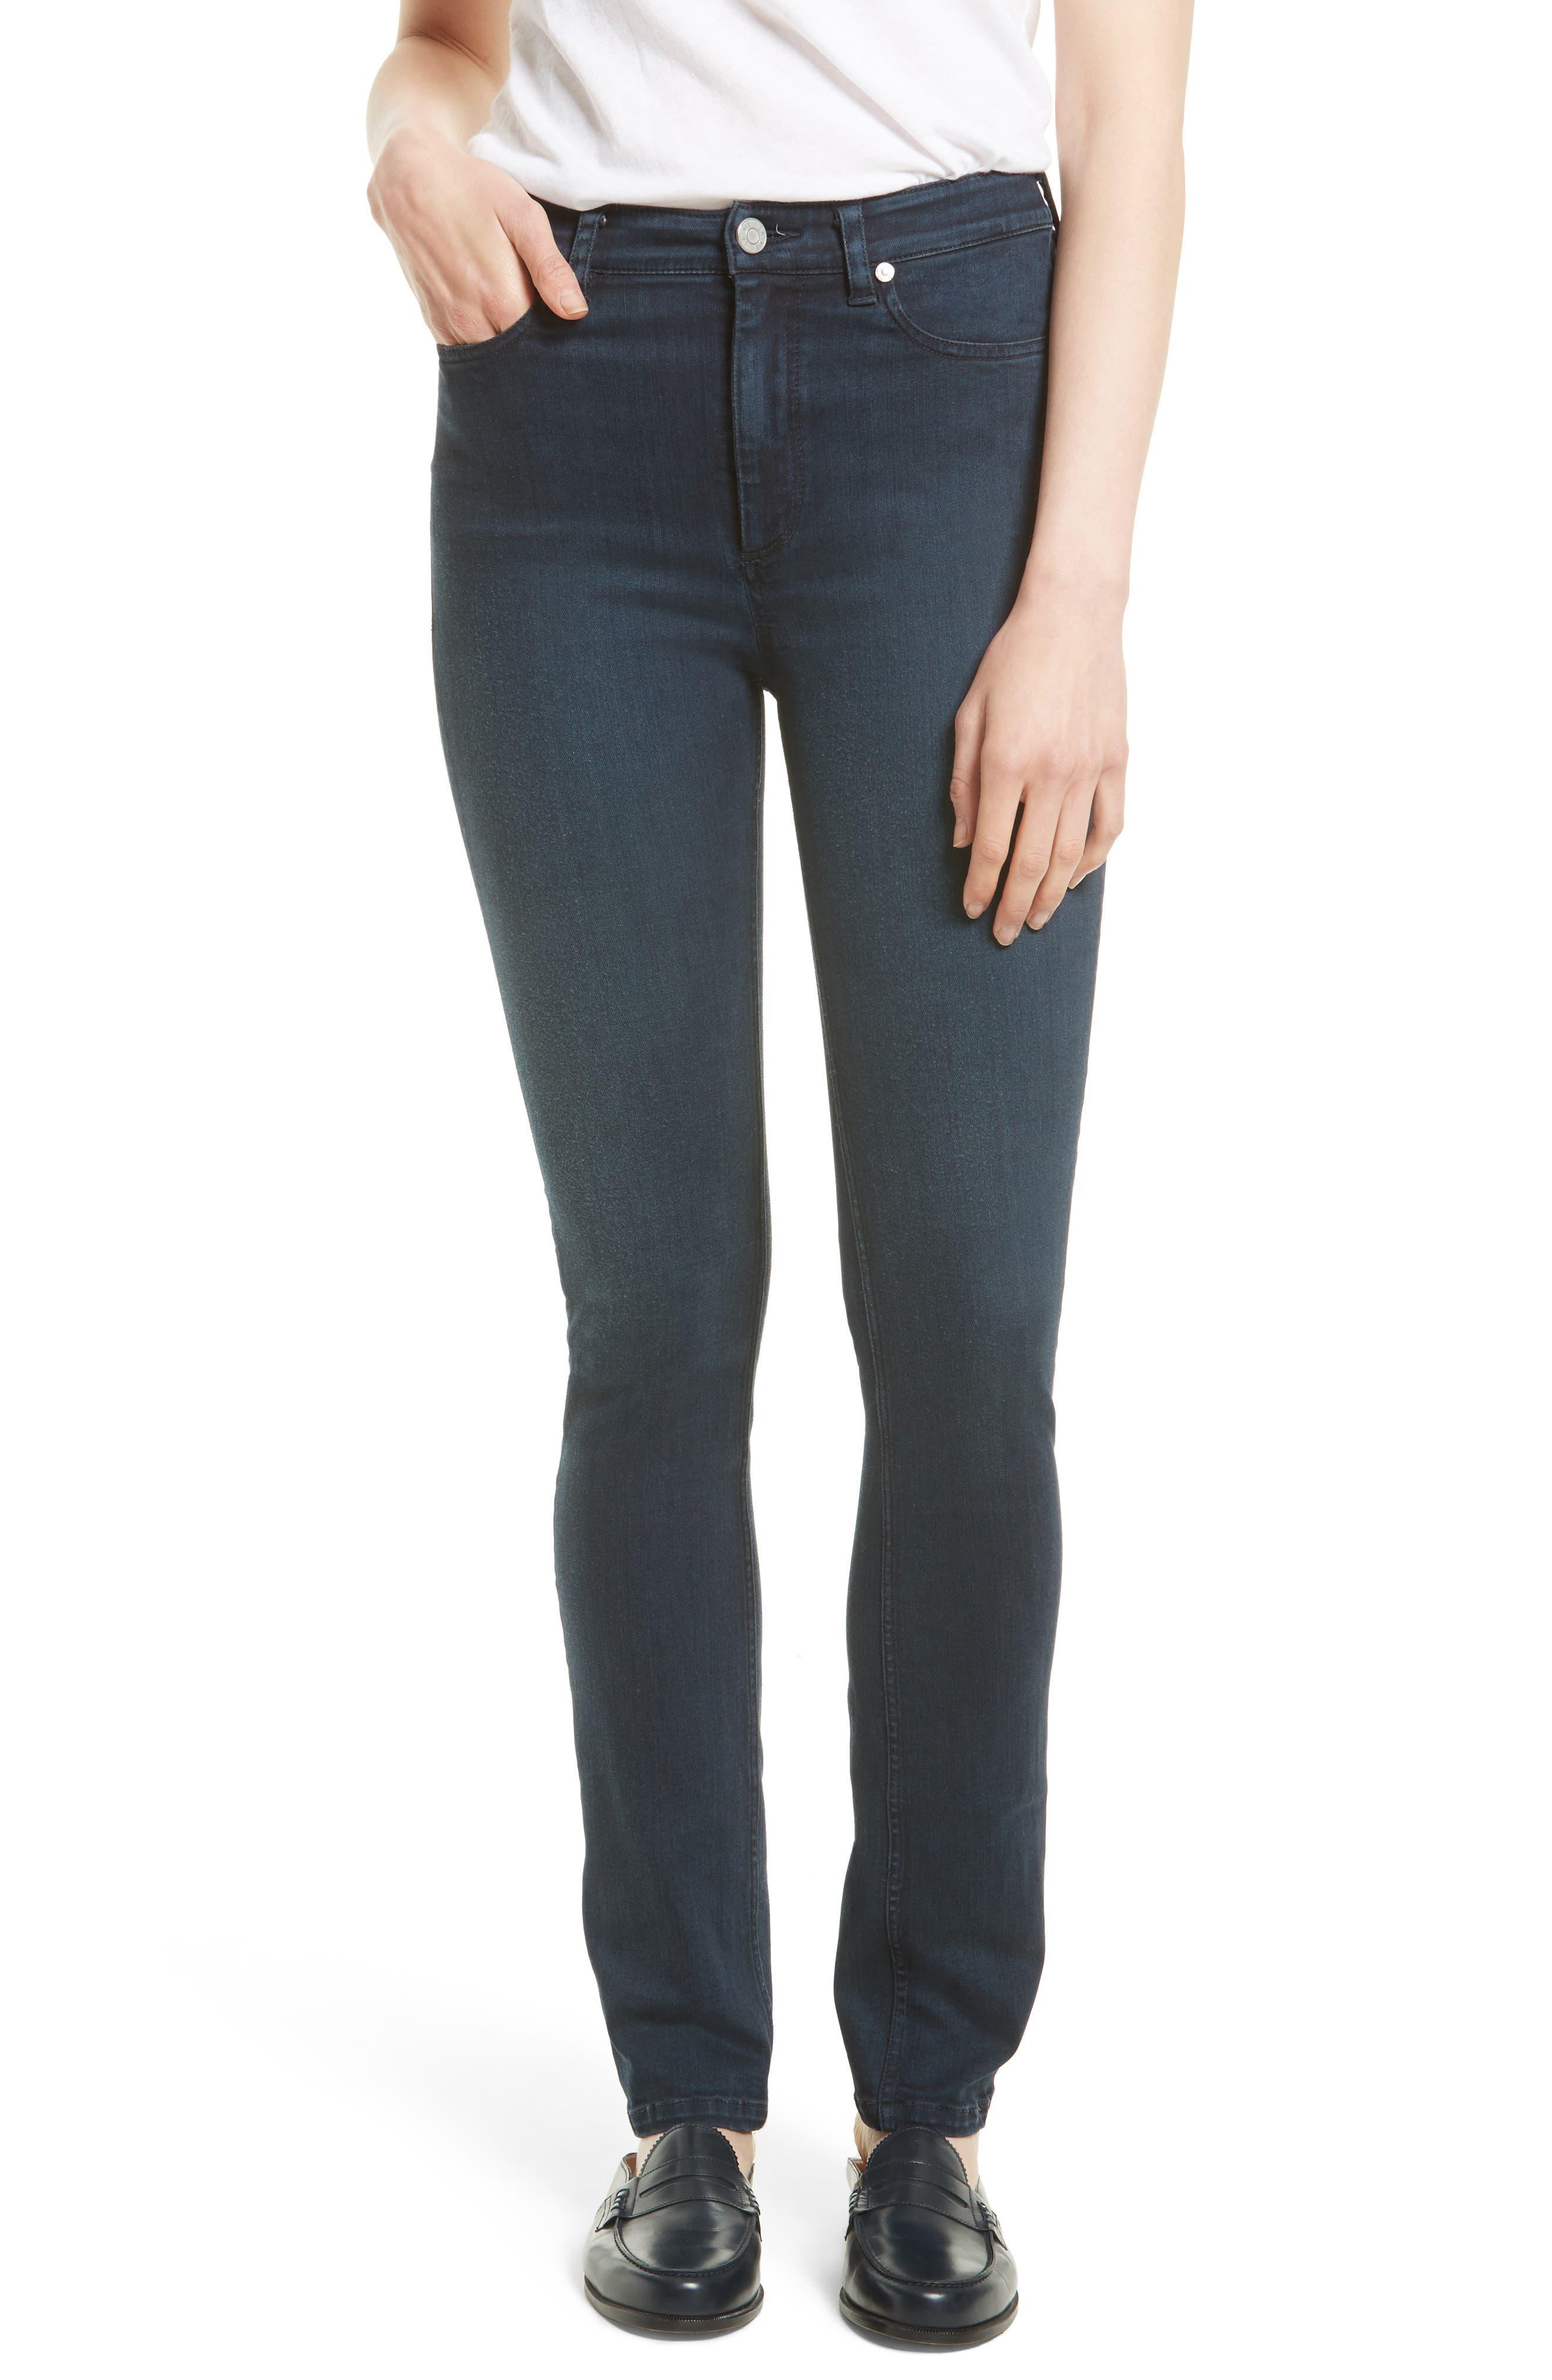 La Vie Rebecca Taylor Celemence Slim Jeans